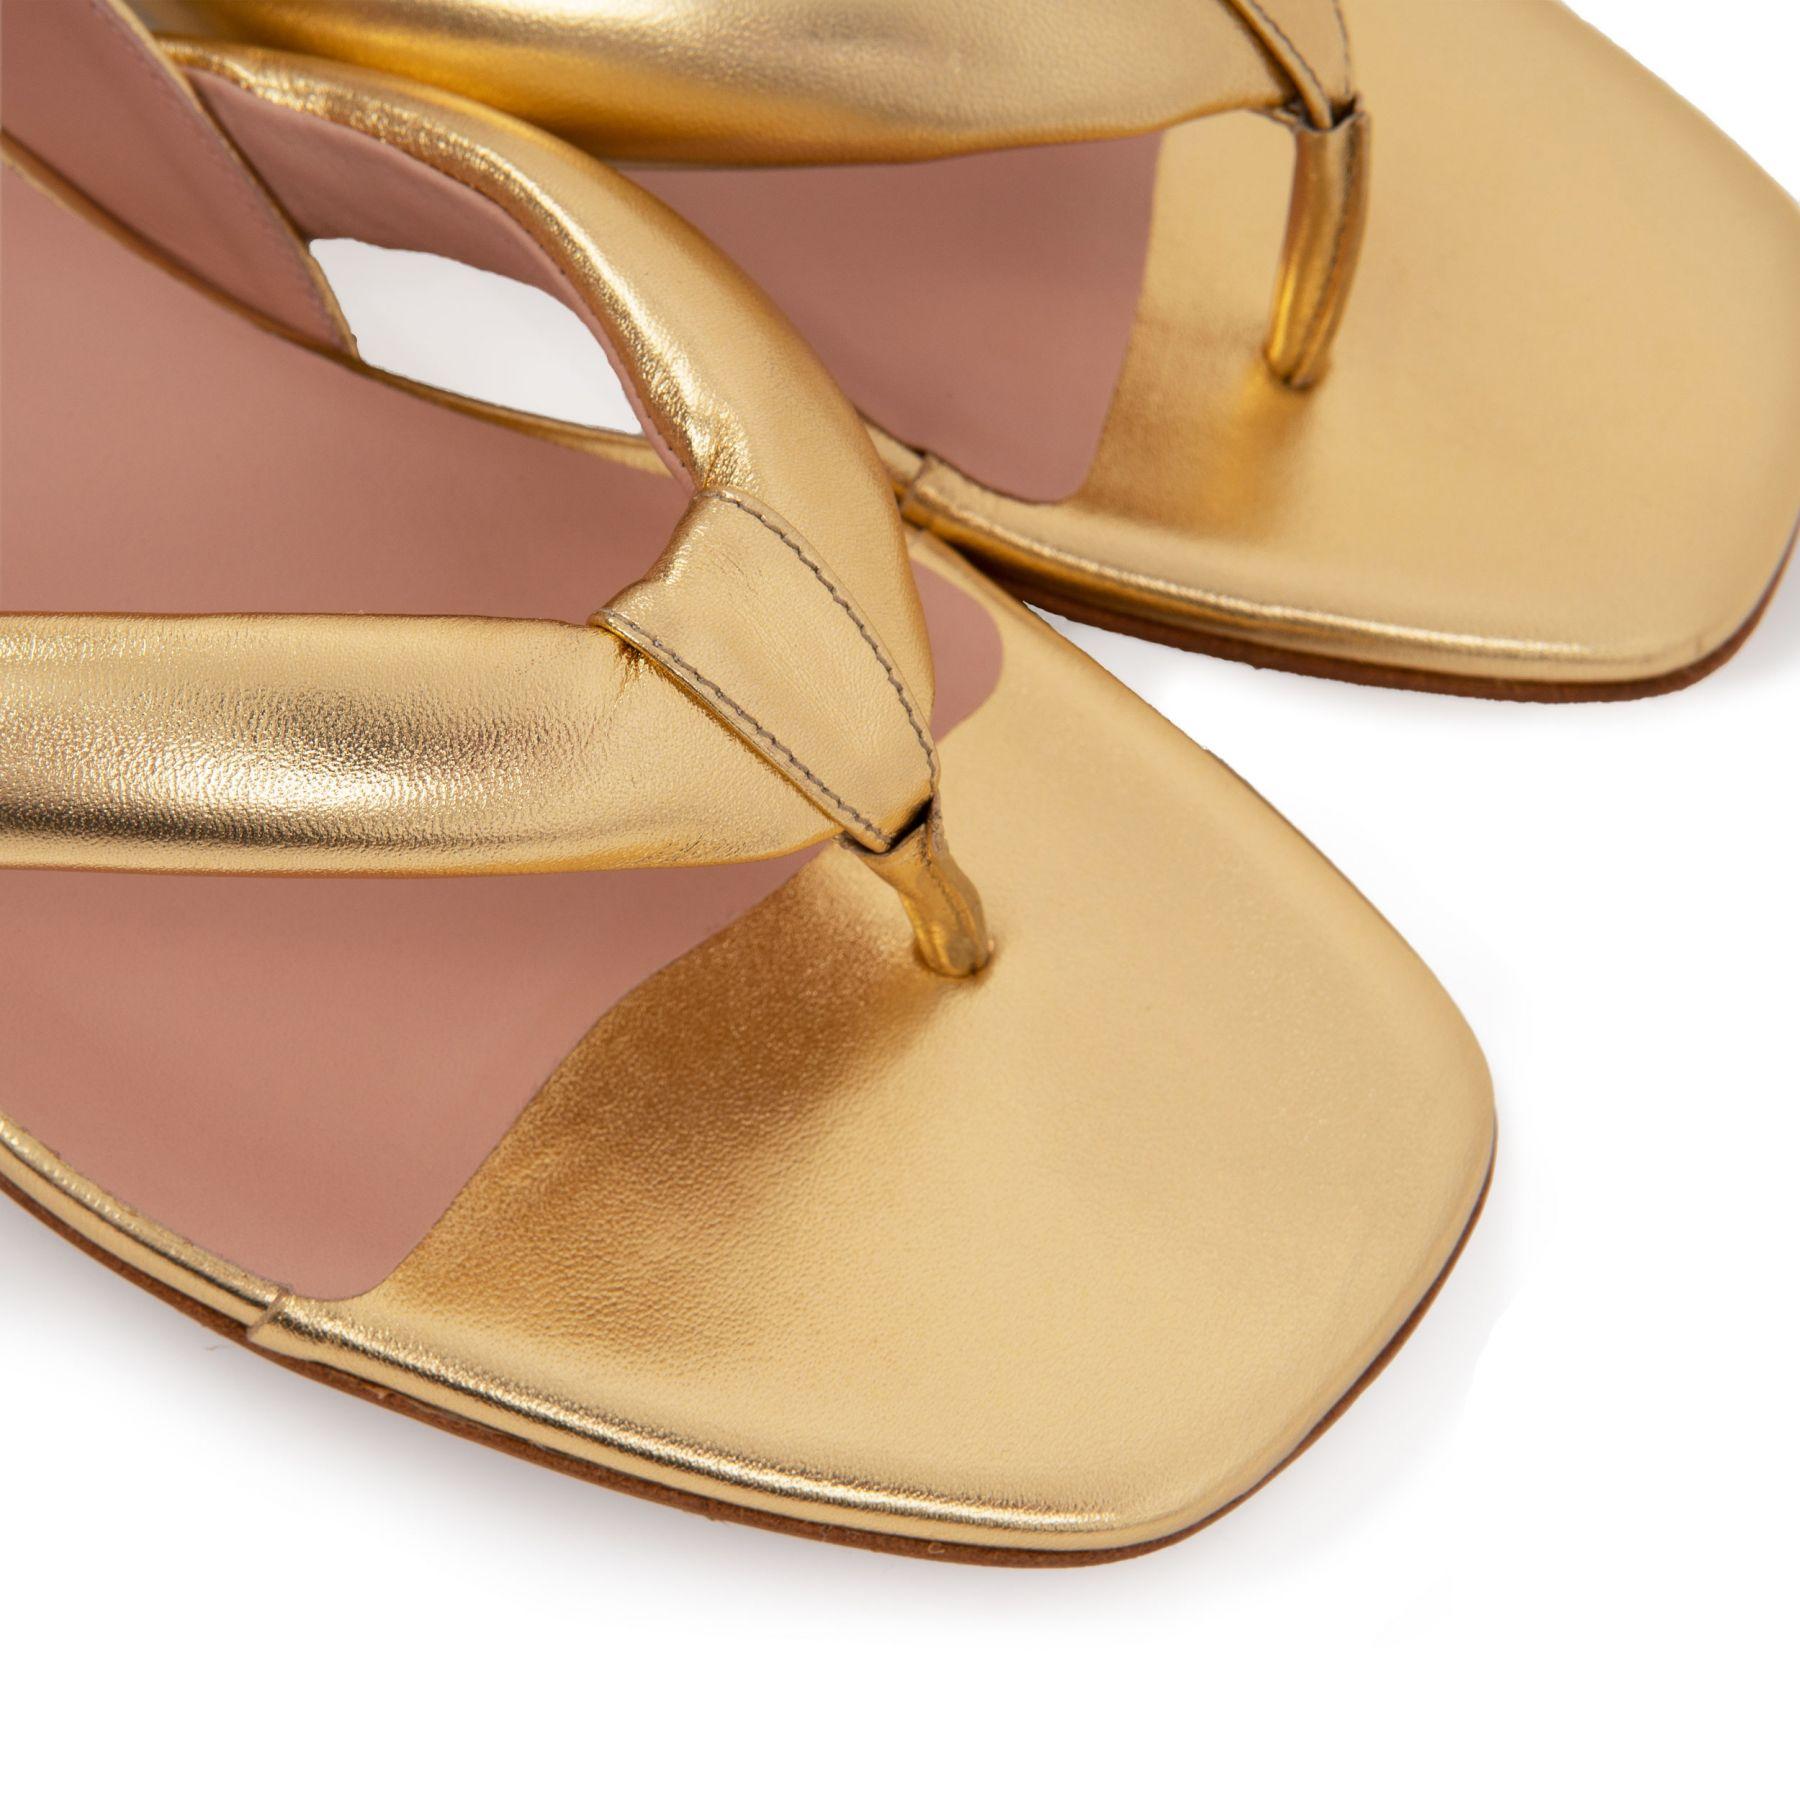 Шлепанцы Gia Bora 02 золотые